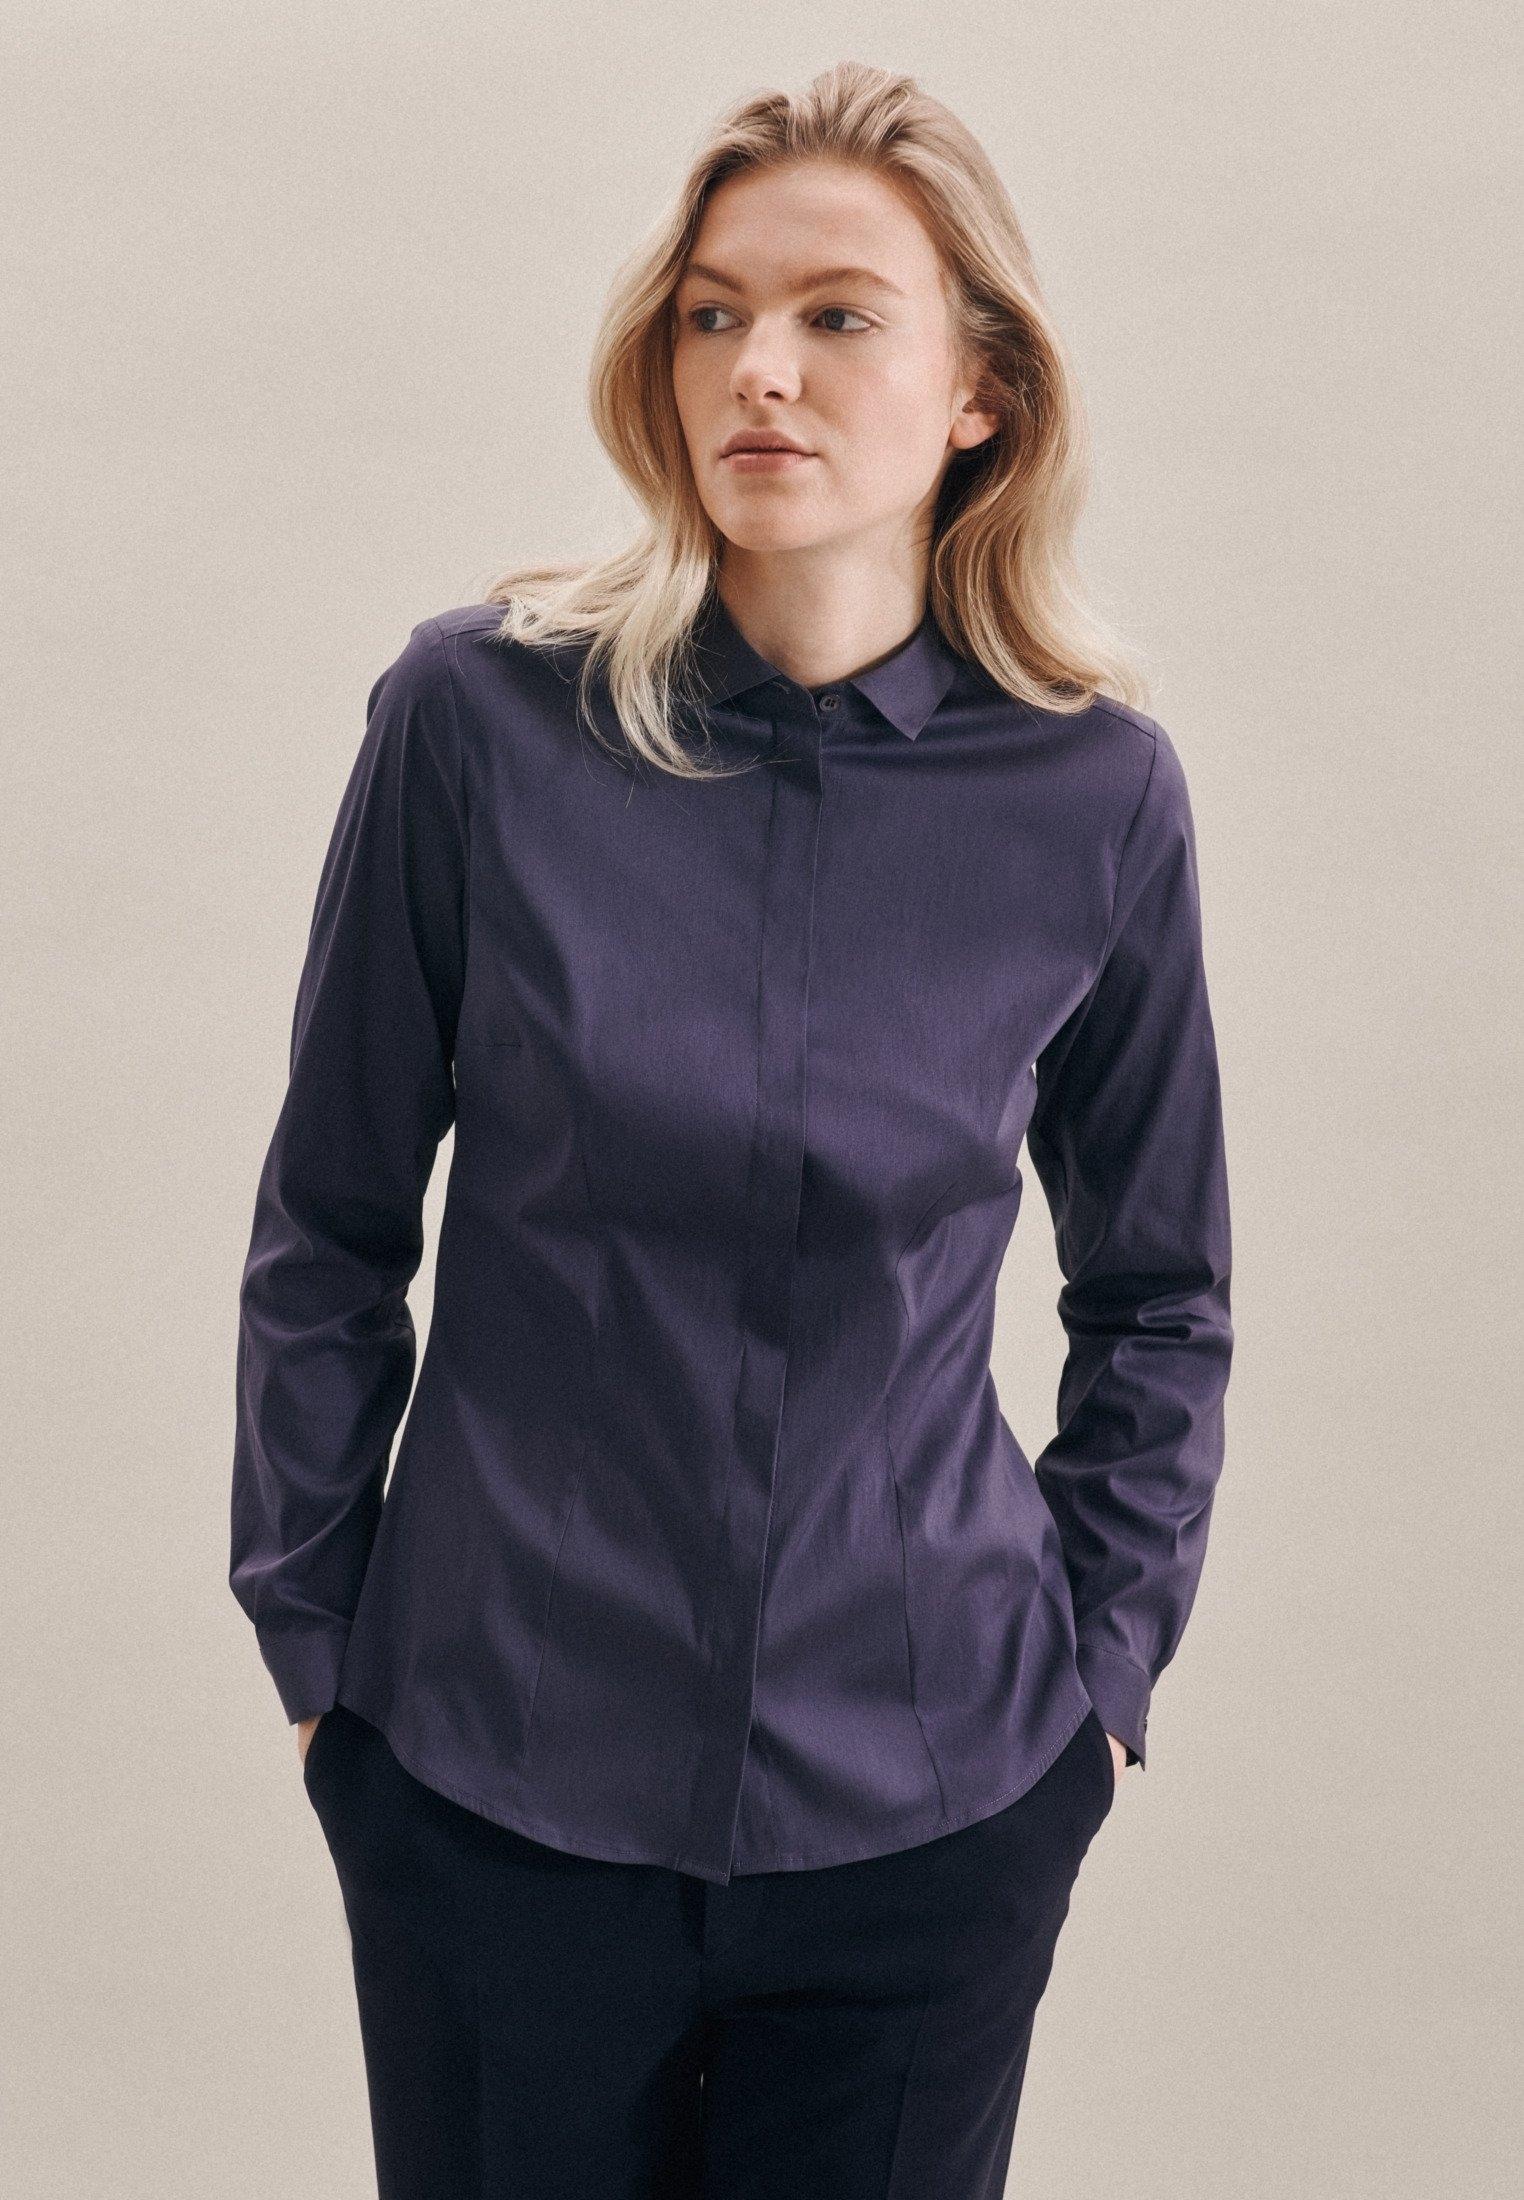 seidensticker overhemdblouse Zwarte roos Lange mouwen kraag uni nu online bestellen